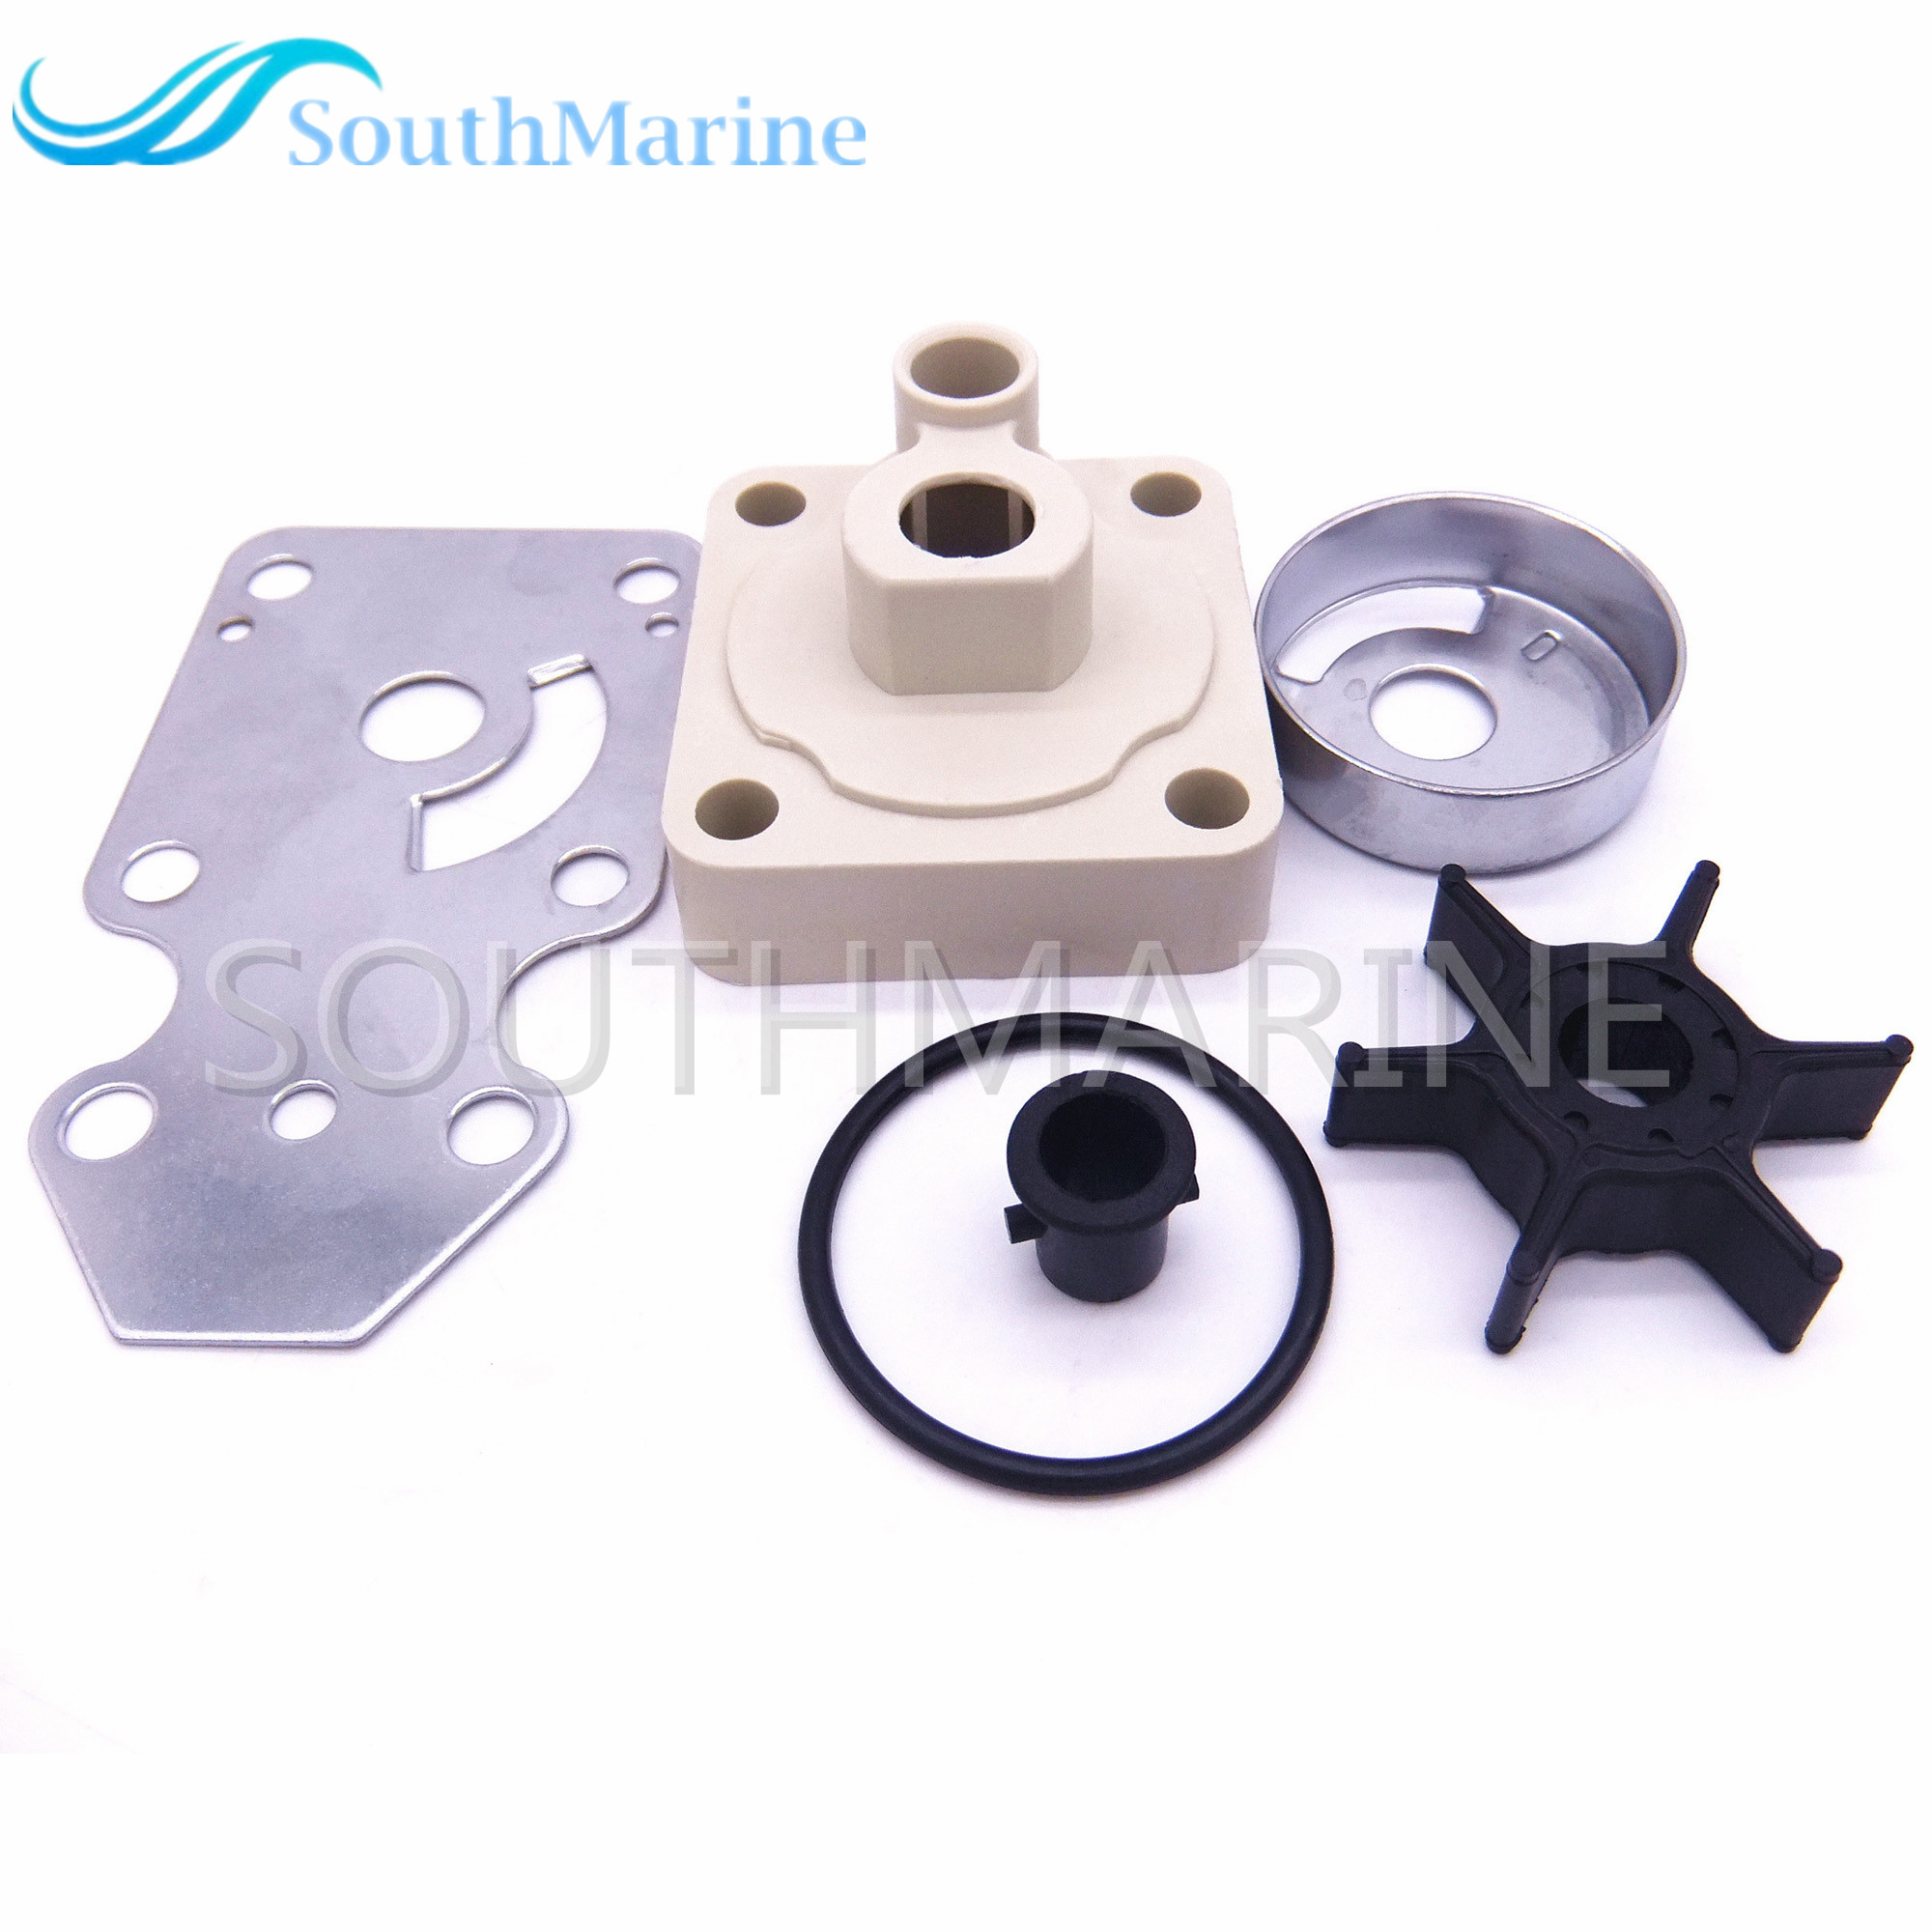 Water Pump Impeller Repair Kit For Parsun HDX / Hidea F15 15hp 2-stroke 4-stroke Outboard Motors